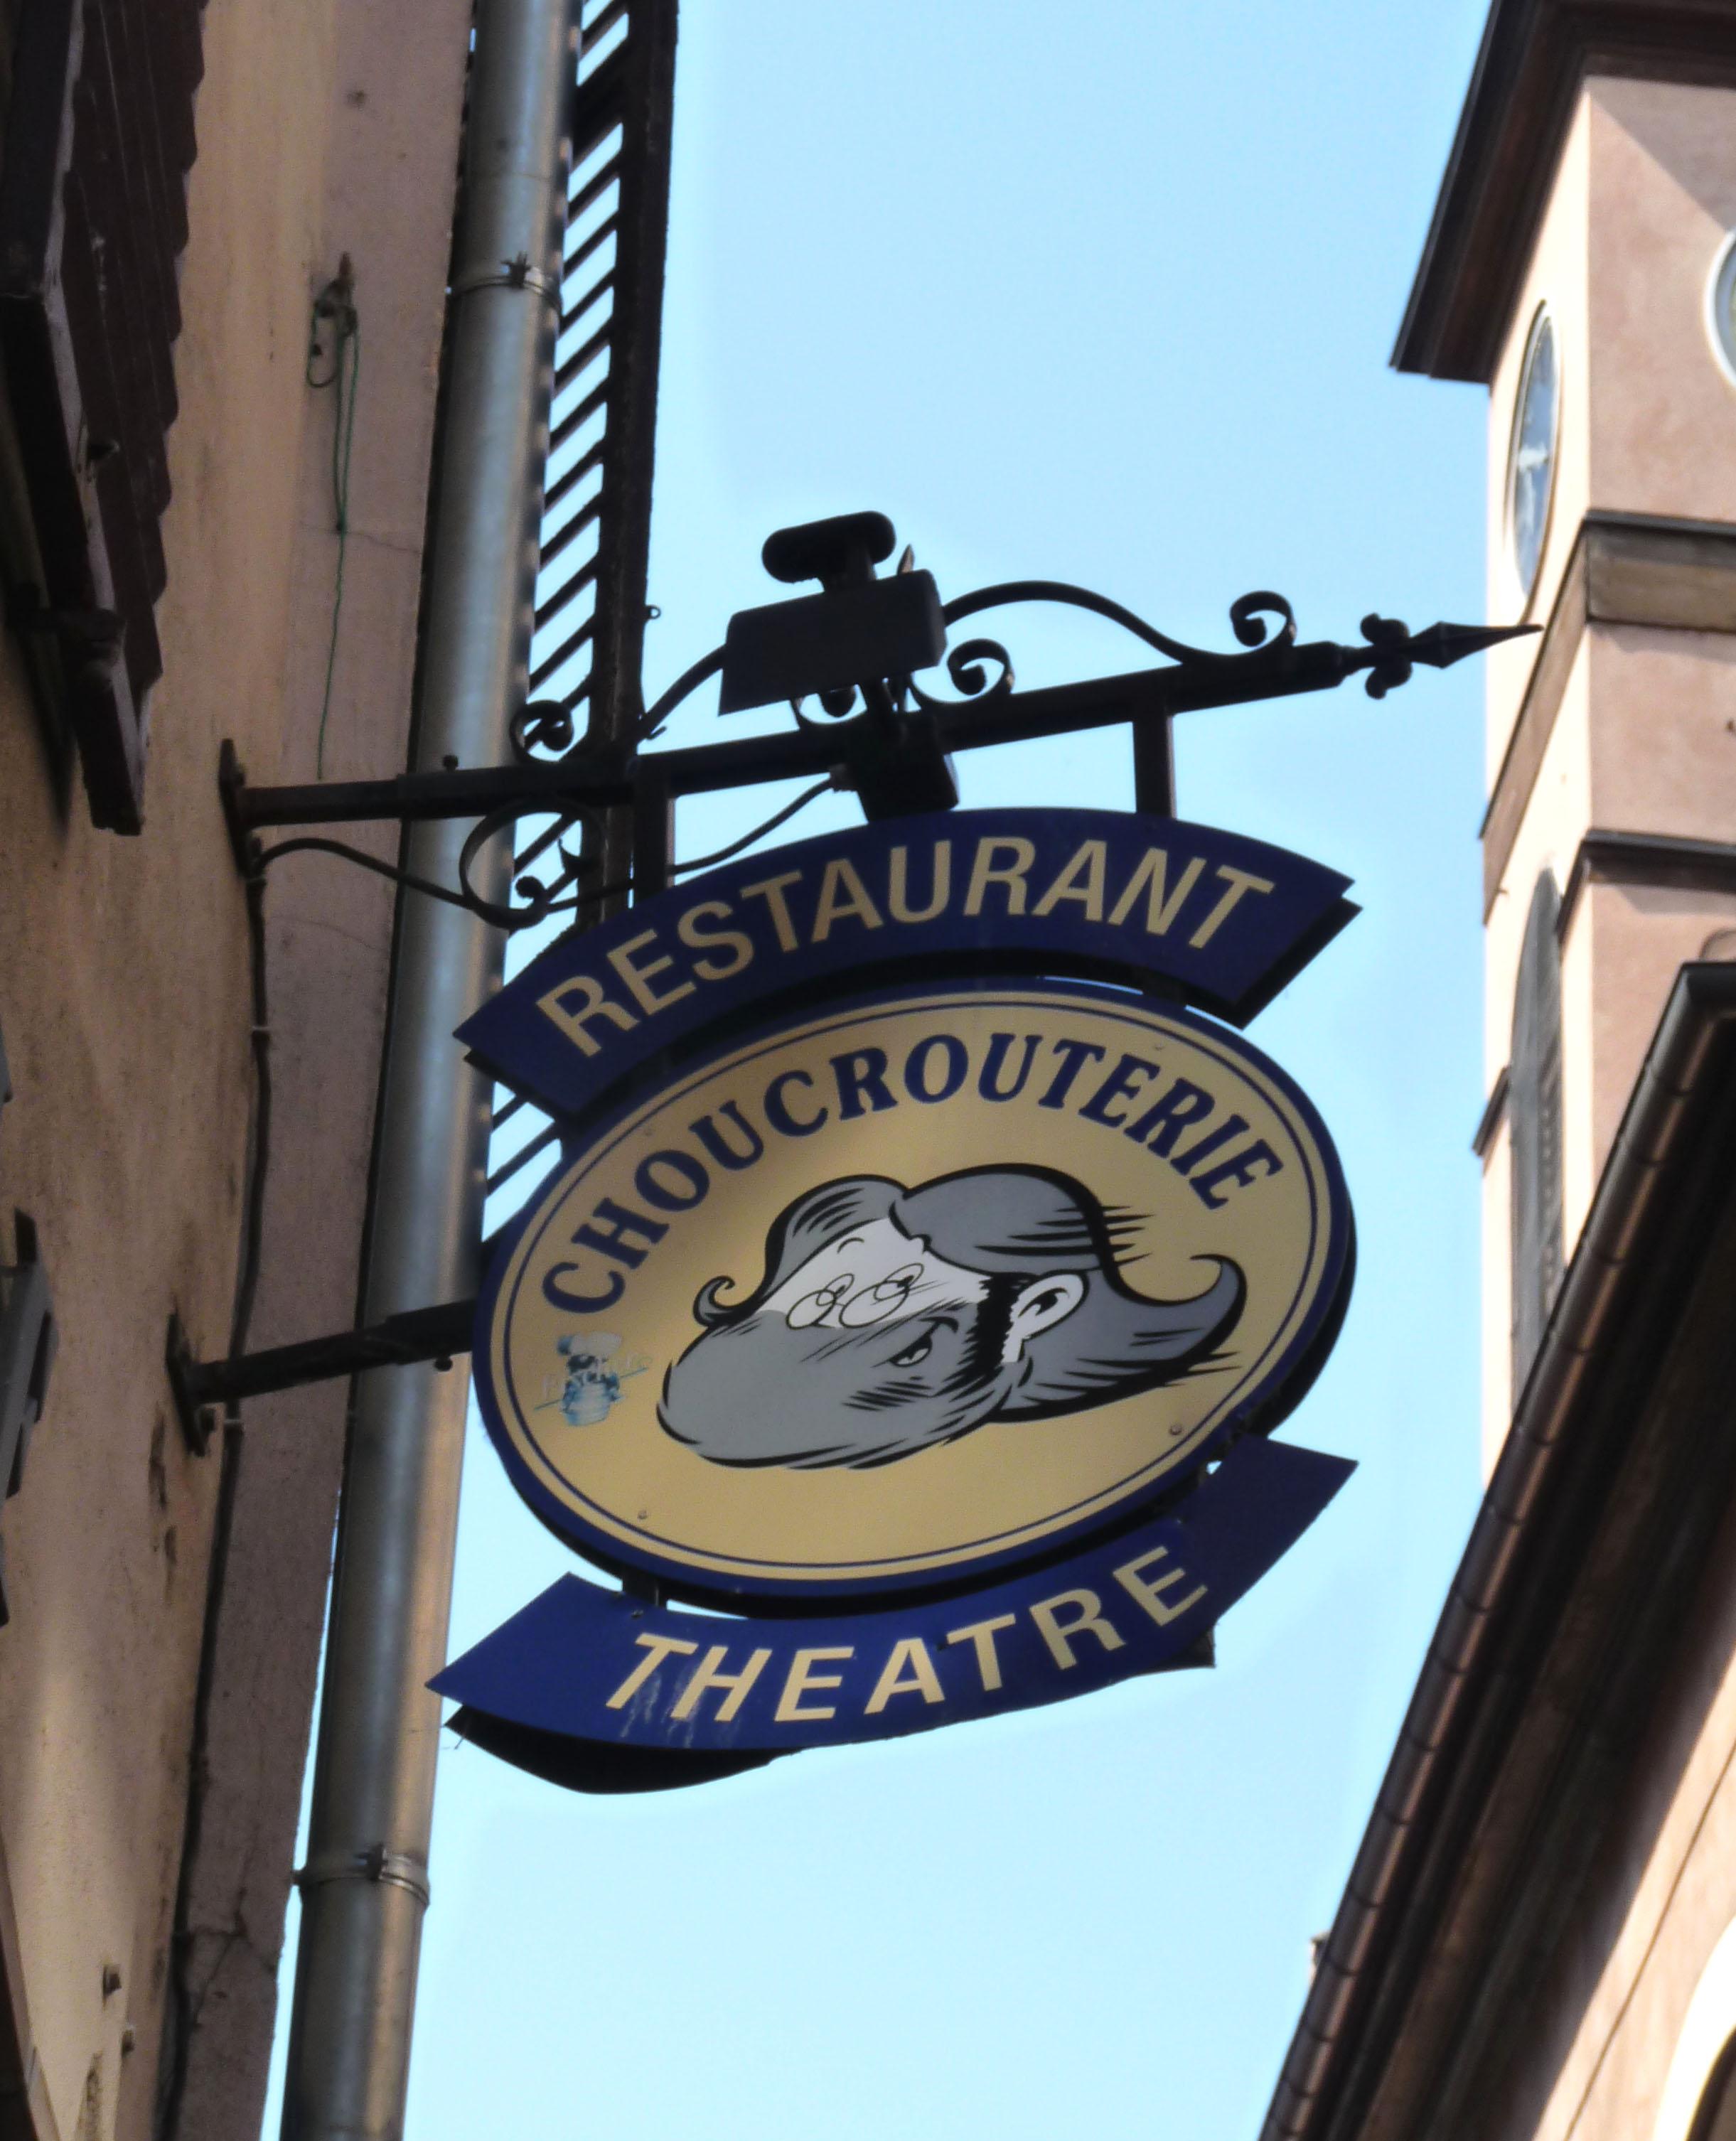 Roger_Siffer-Choucrouterie-Strasbourg-1490048420.jpg